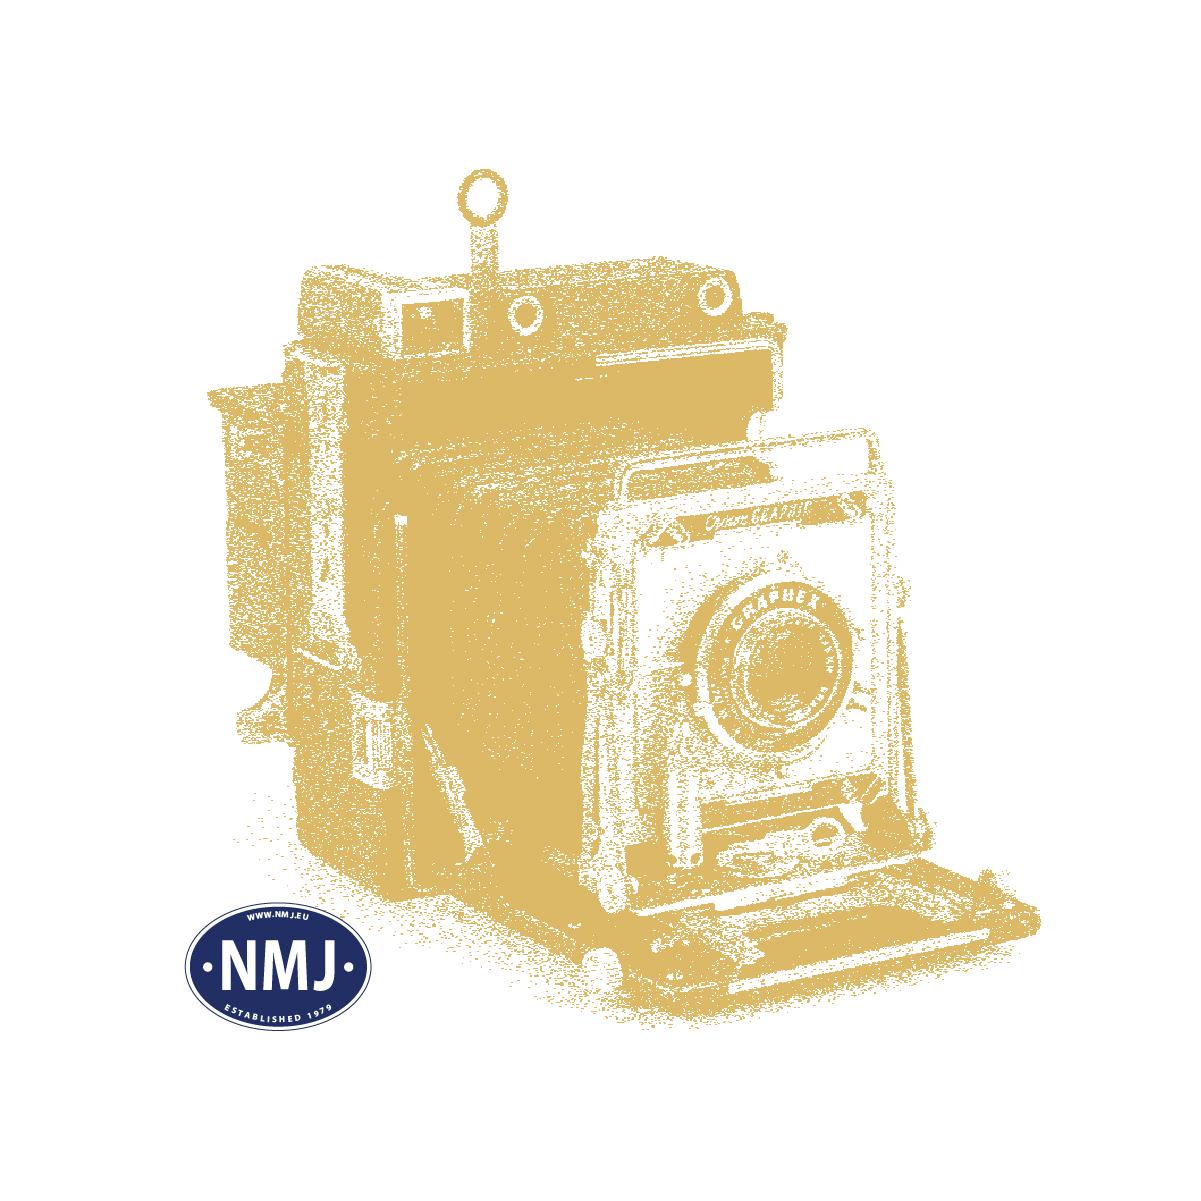 NMJT90404 - NMJ Topline 5407 Diesellok der SNCB, DCC m/ Sound